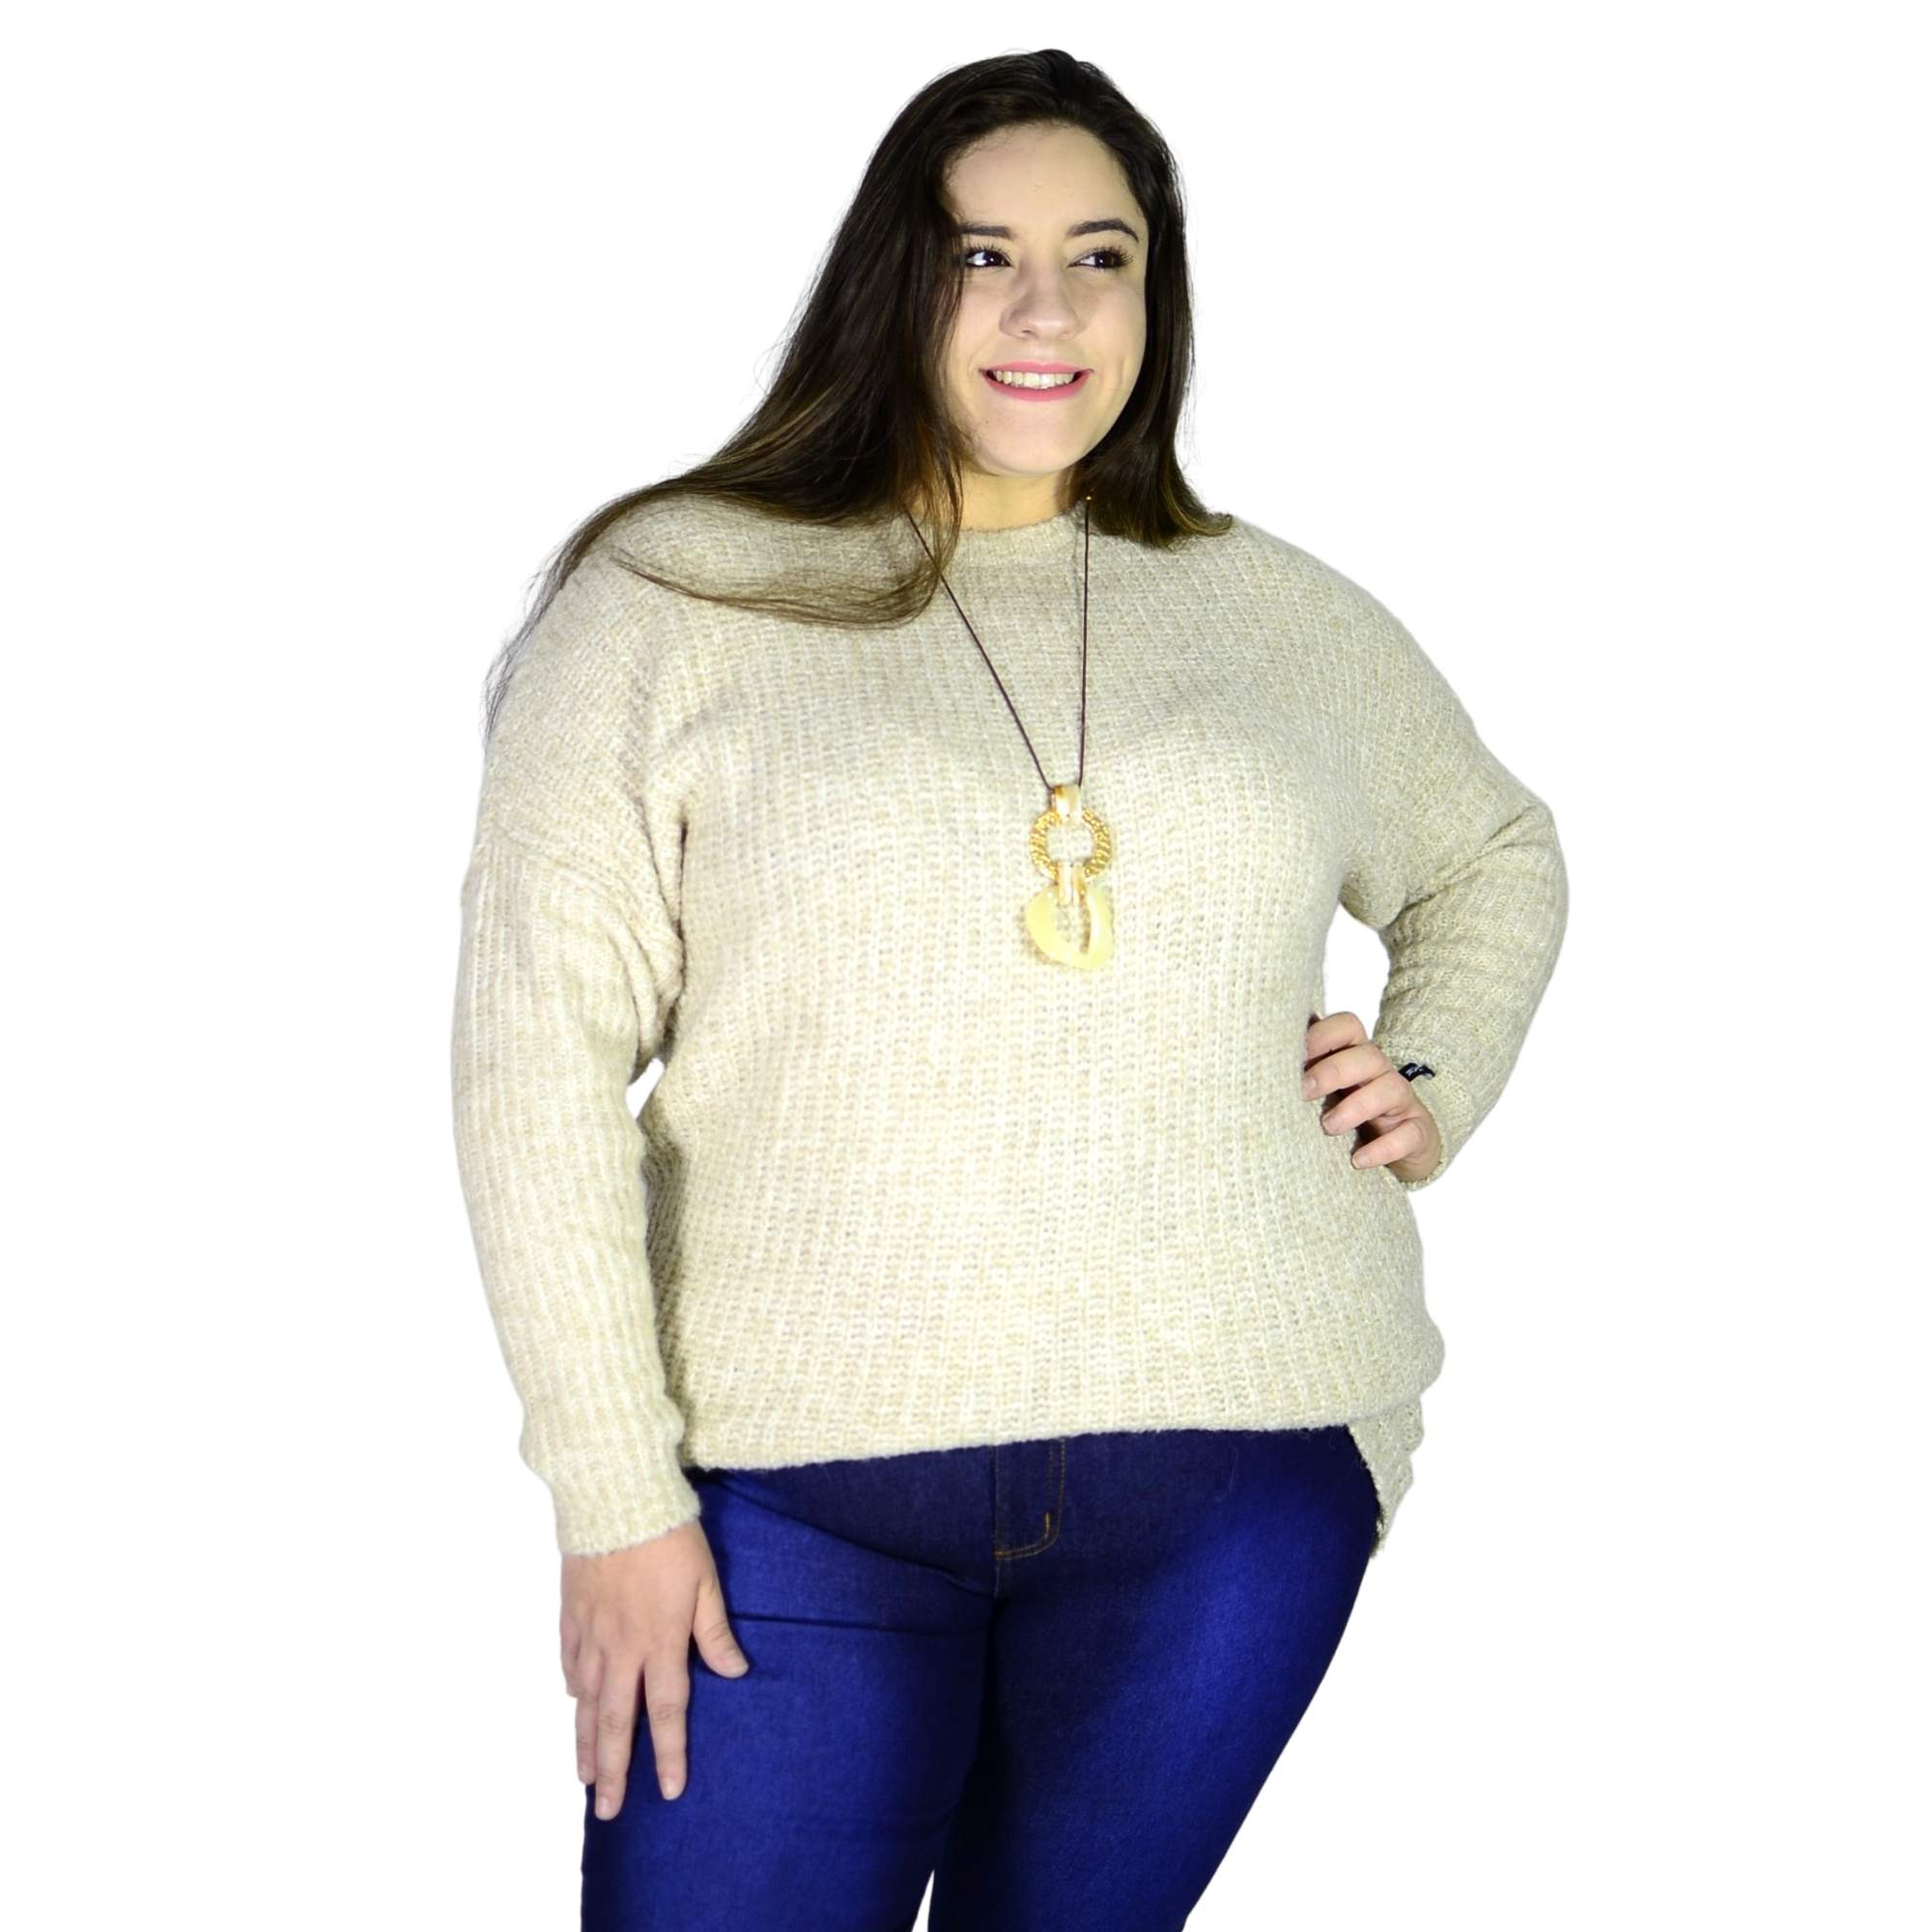 Blusão Tricot Bege Alongado 4849